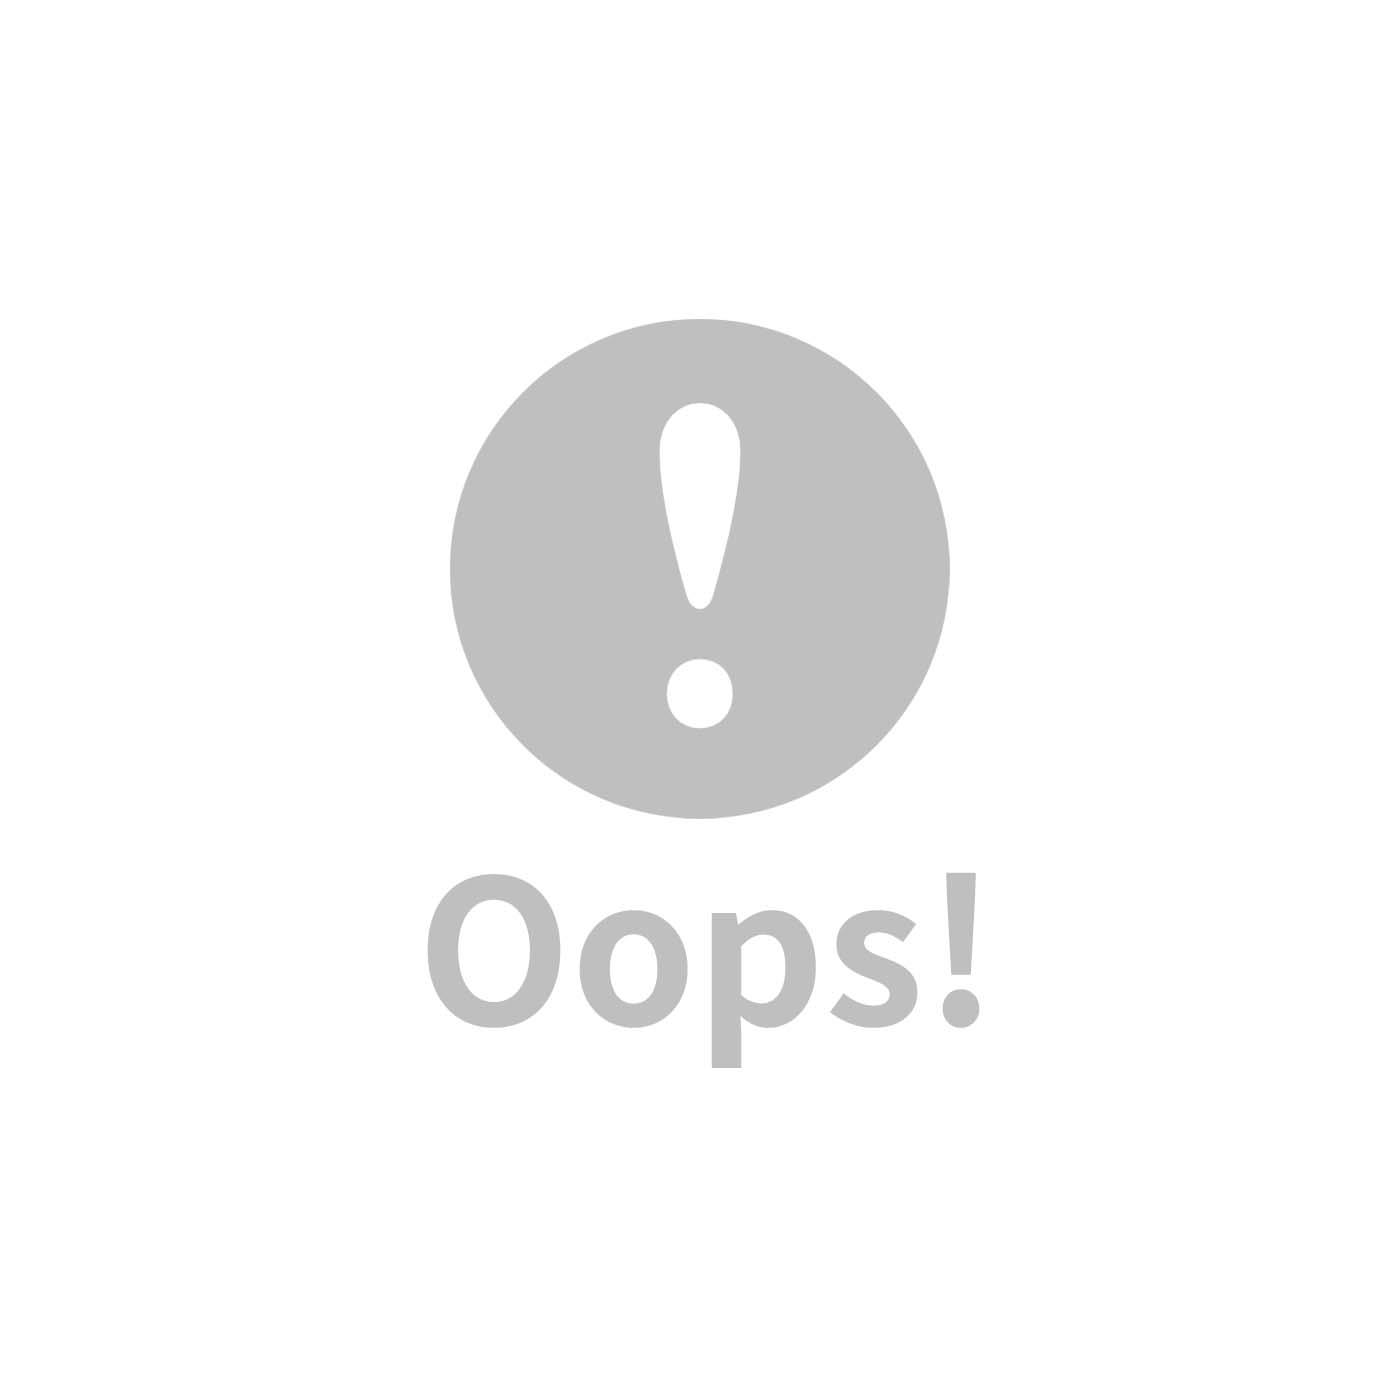 Cuna Tent x Sagepole成長美學小木屋地墊 (矩形)